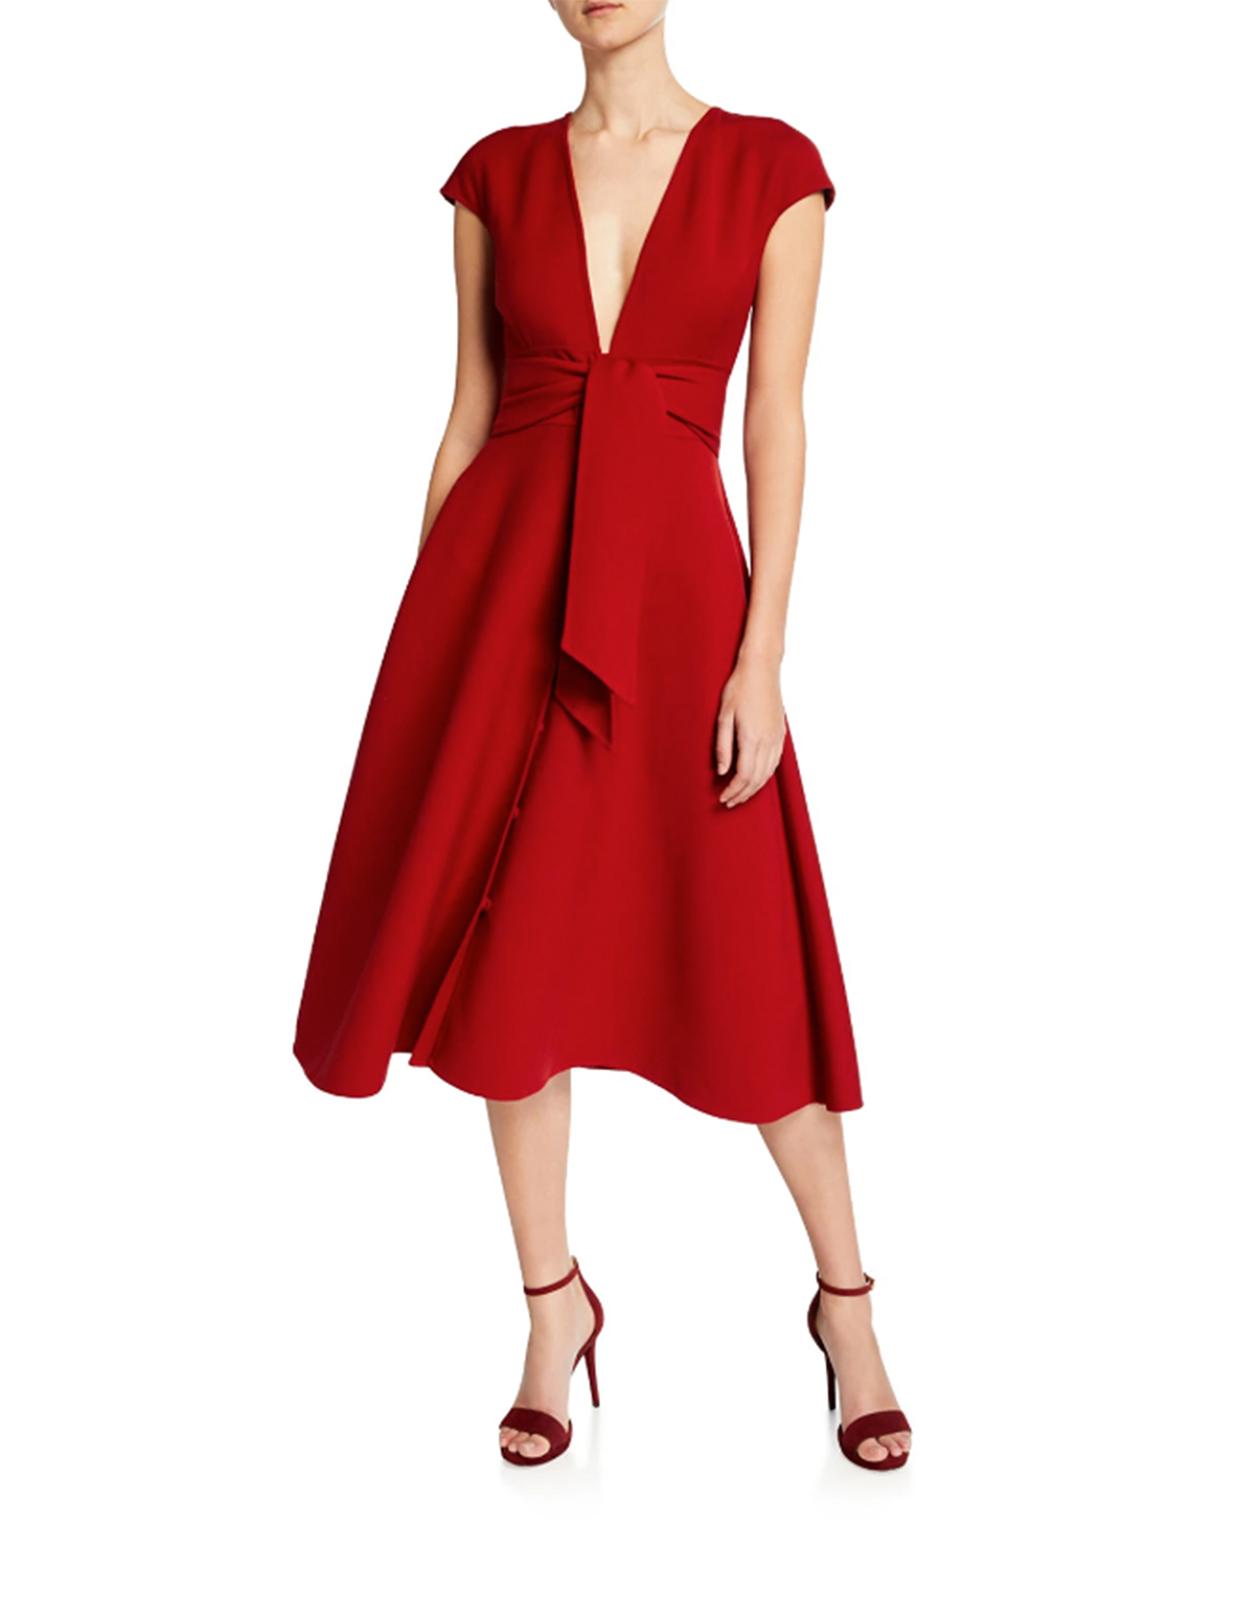 Oscar De La Renta V-Neck Short-Sleeved Dress